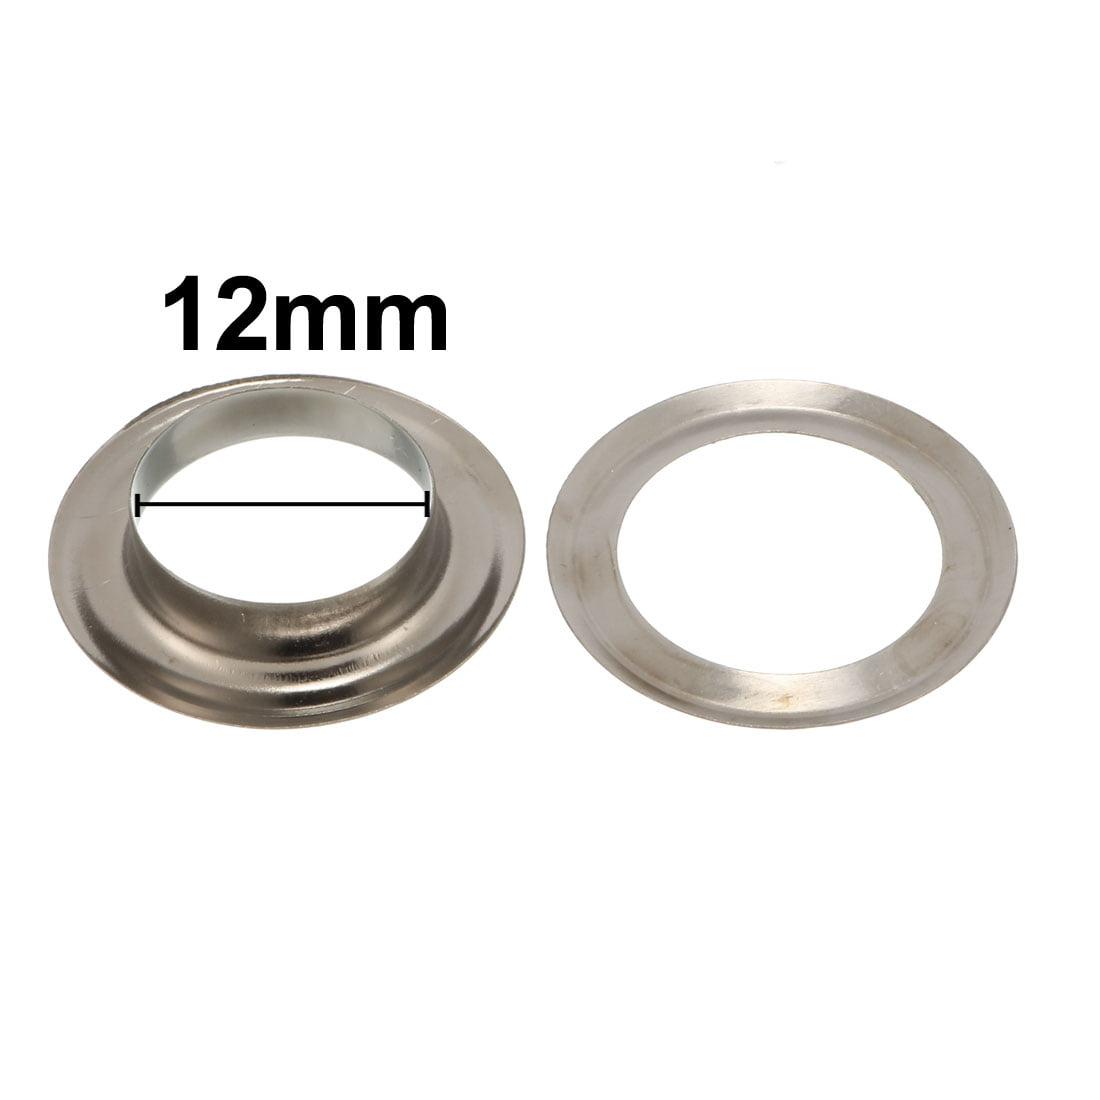 1000Pcs 12mm Eyelet 19mm Flange Dia 4mm Height Brass Grommet Black w Washer - image 2 of 4